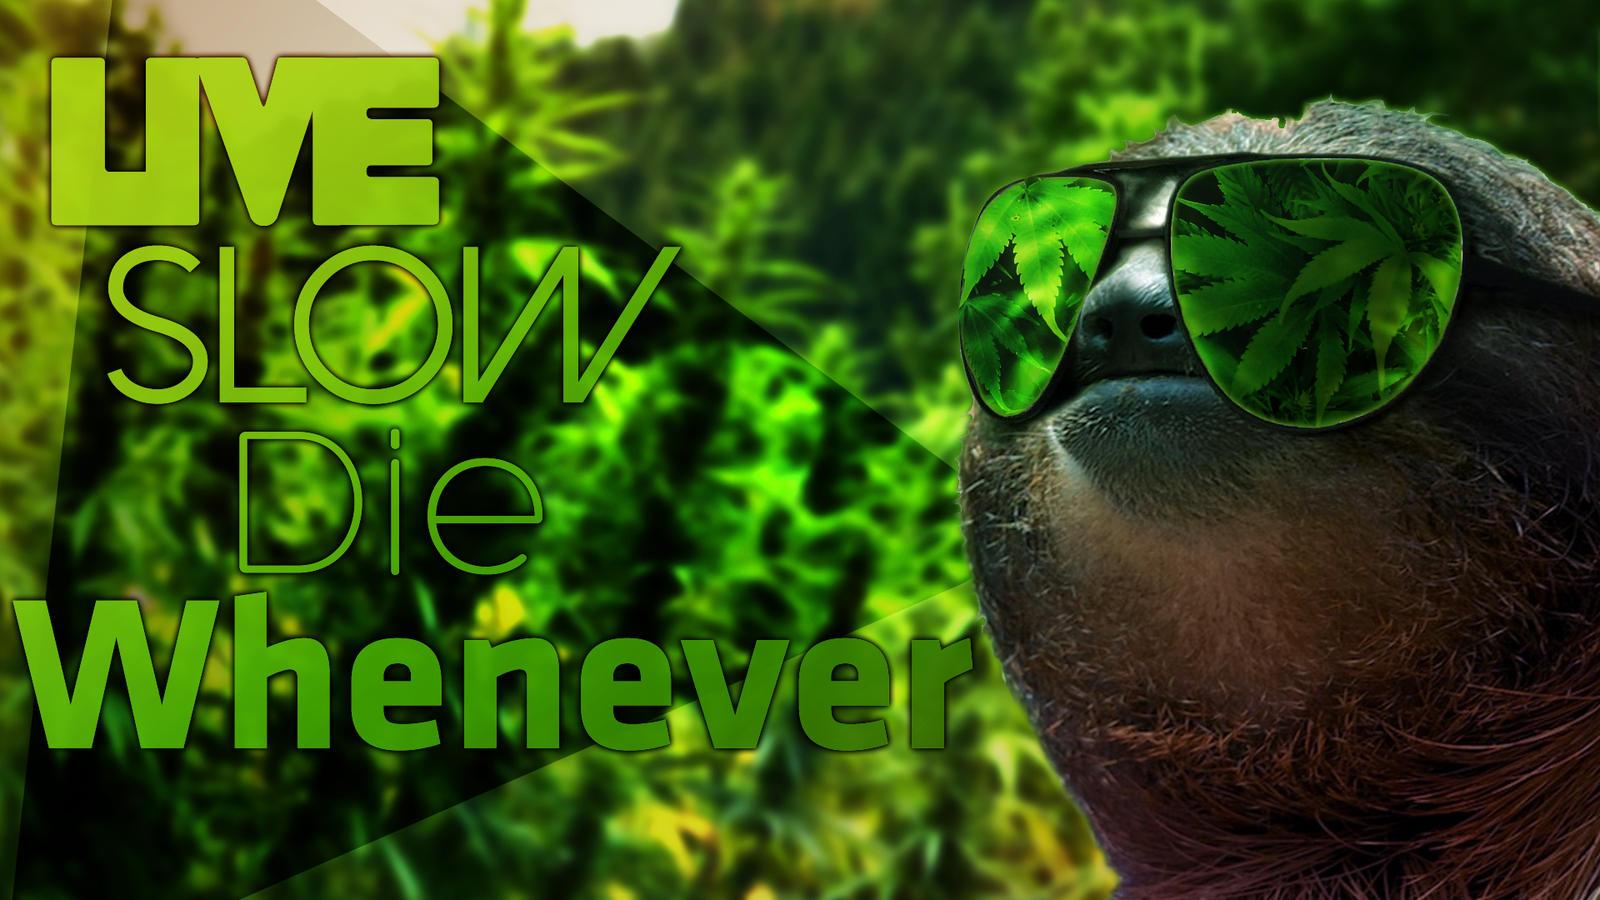 Live Slow Die Whenever By Vulcanov On Deviantart